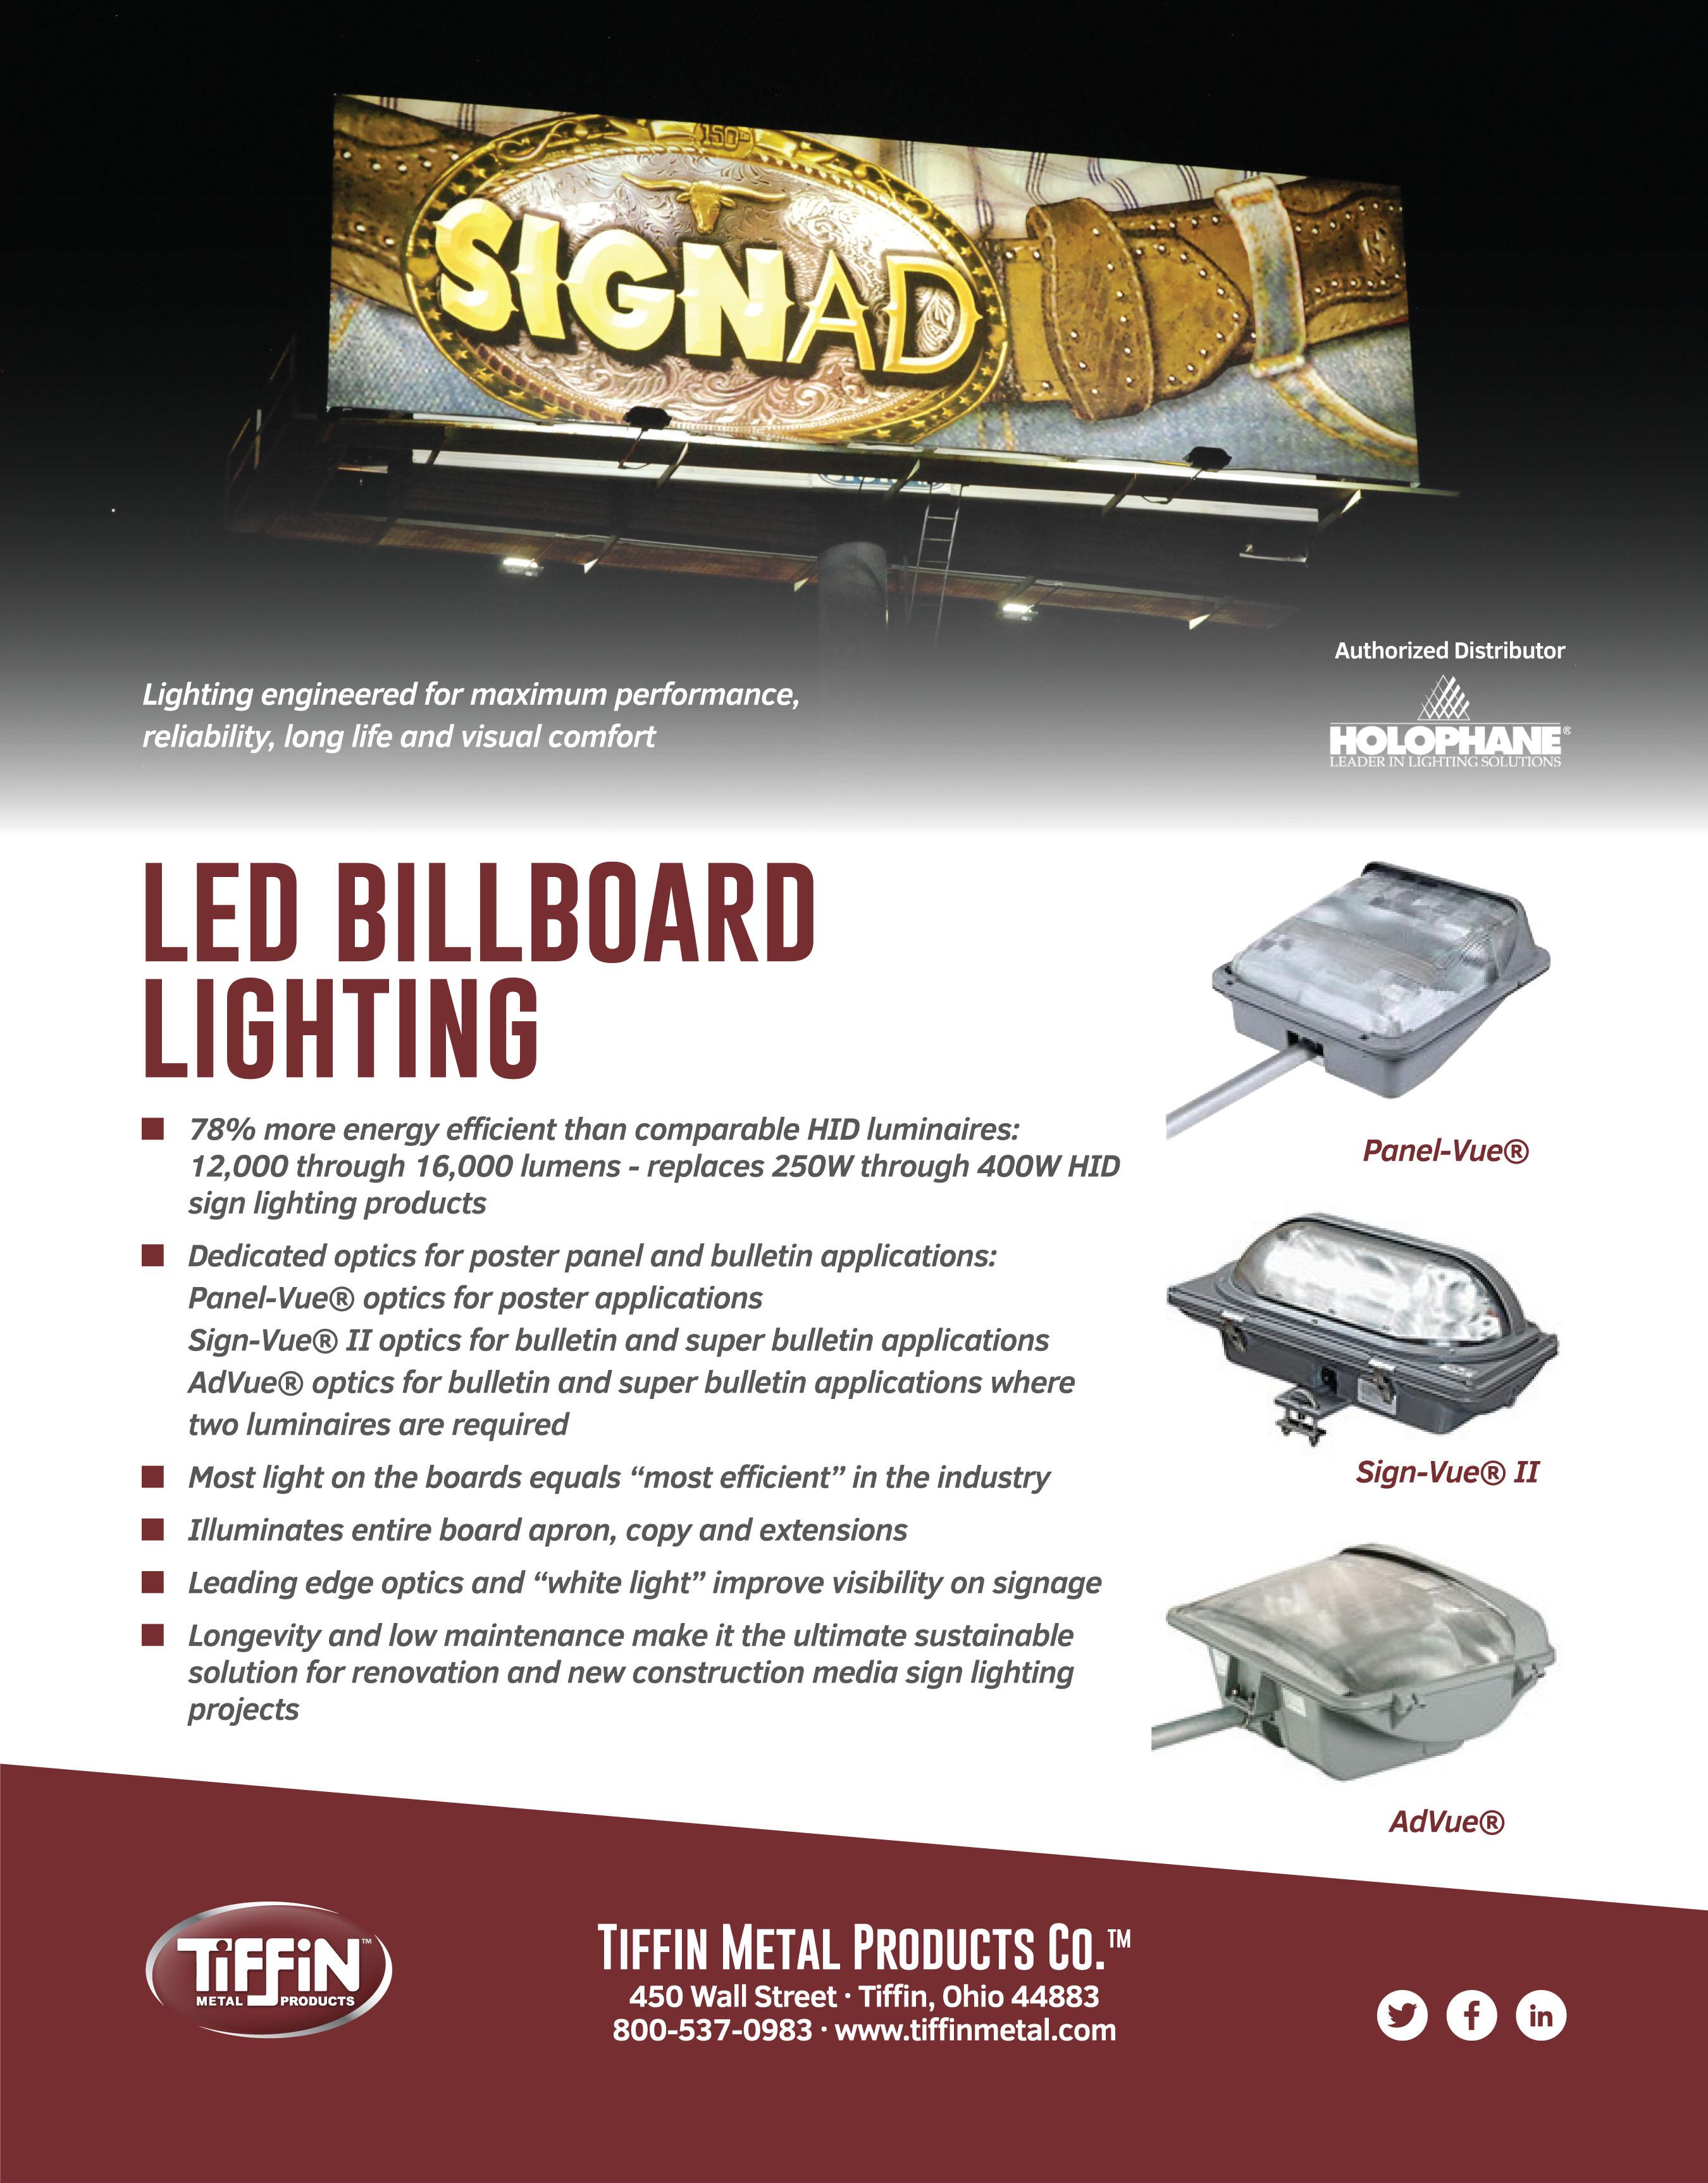 LED Billboard Lighting Cut Sheet